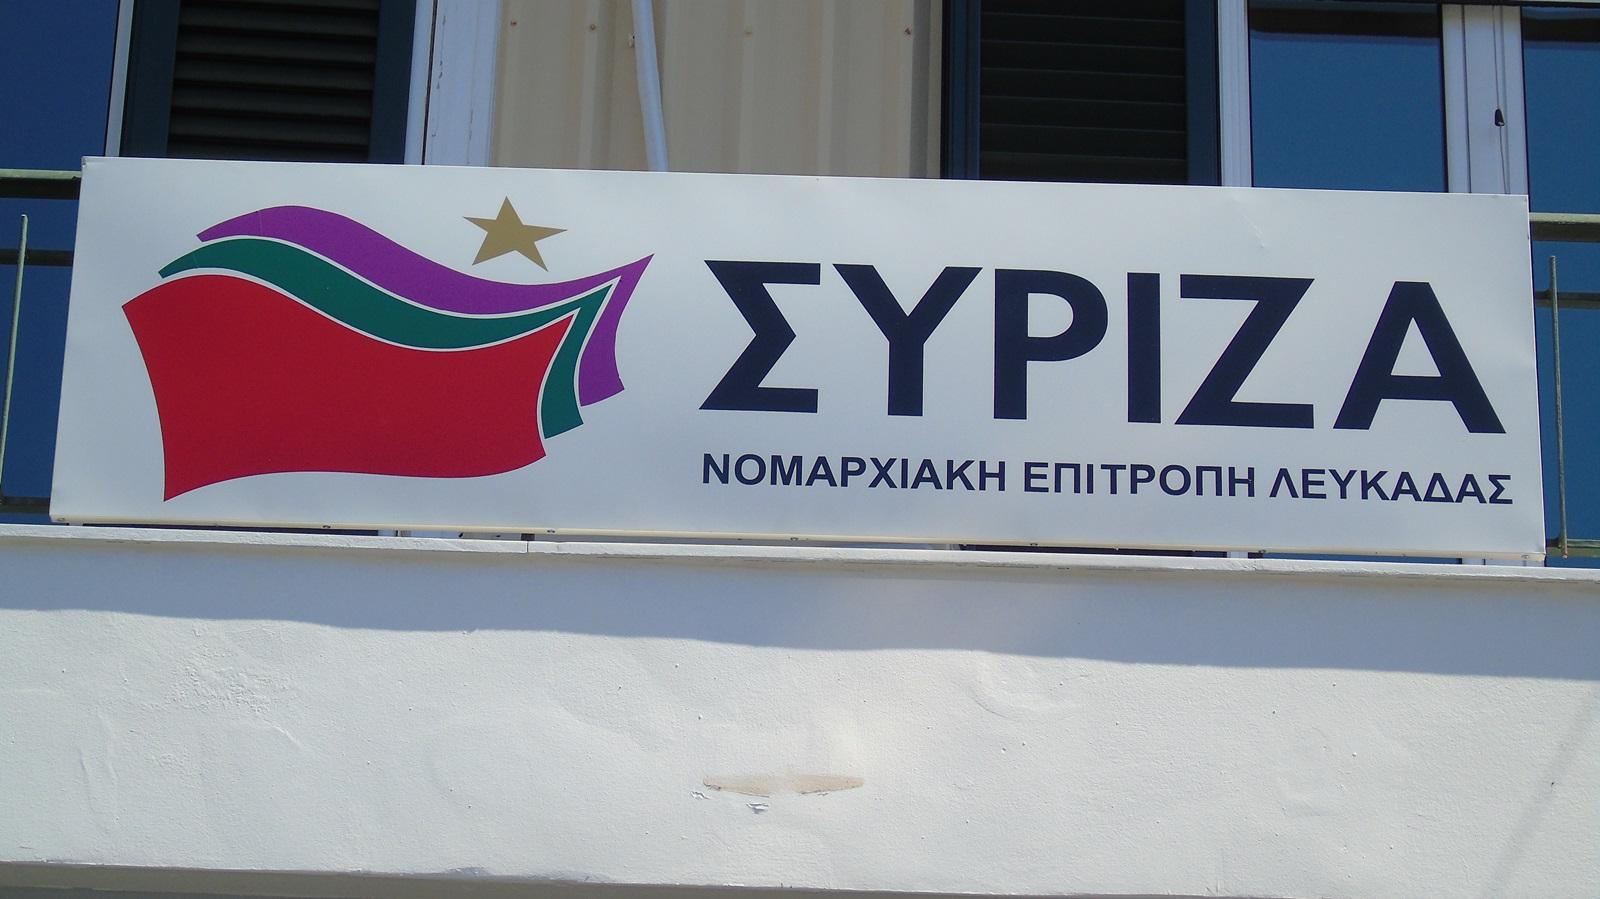 nomarxiaki_SYRIZA